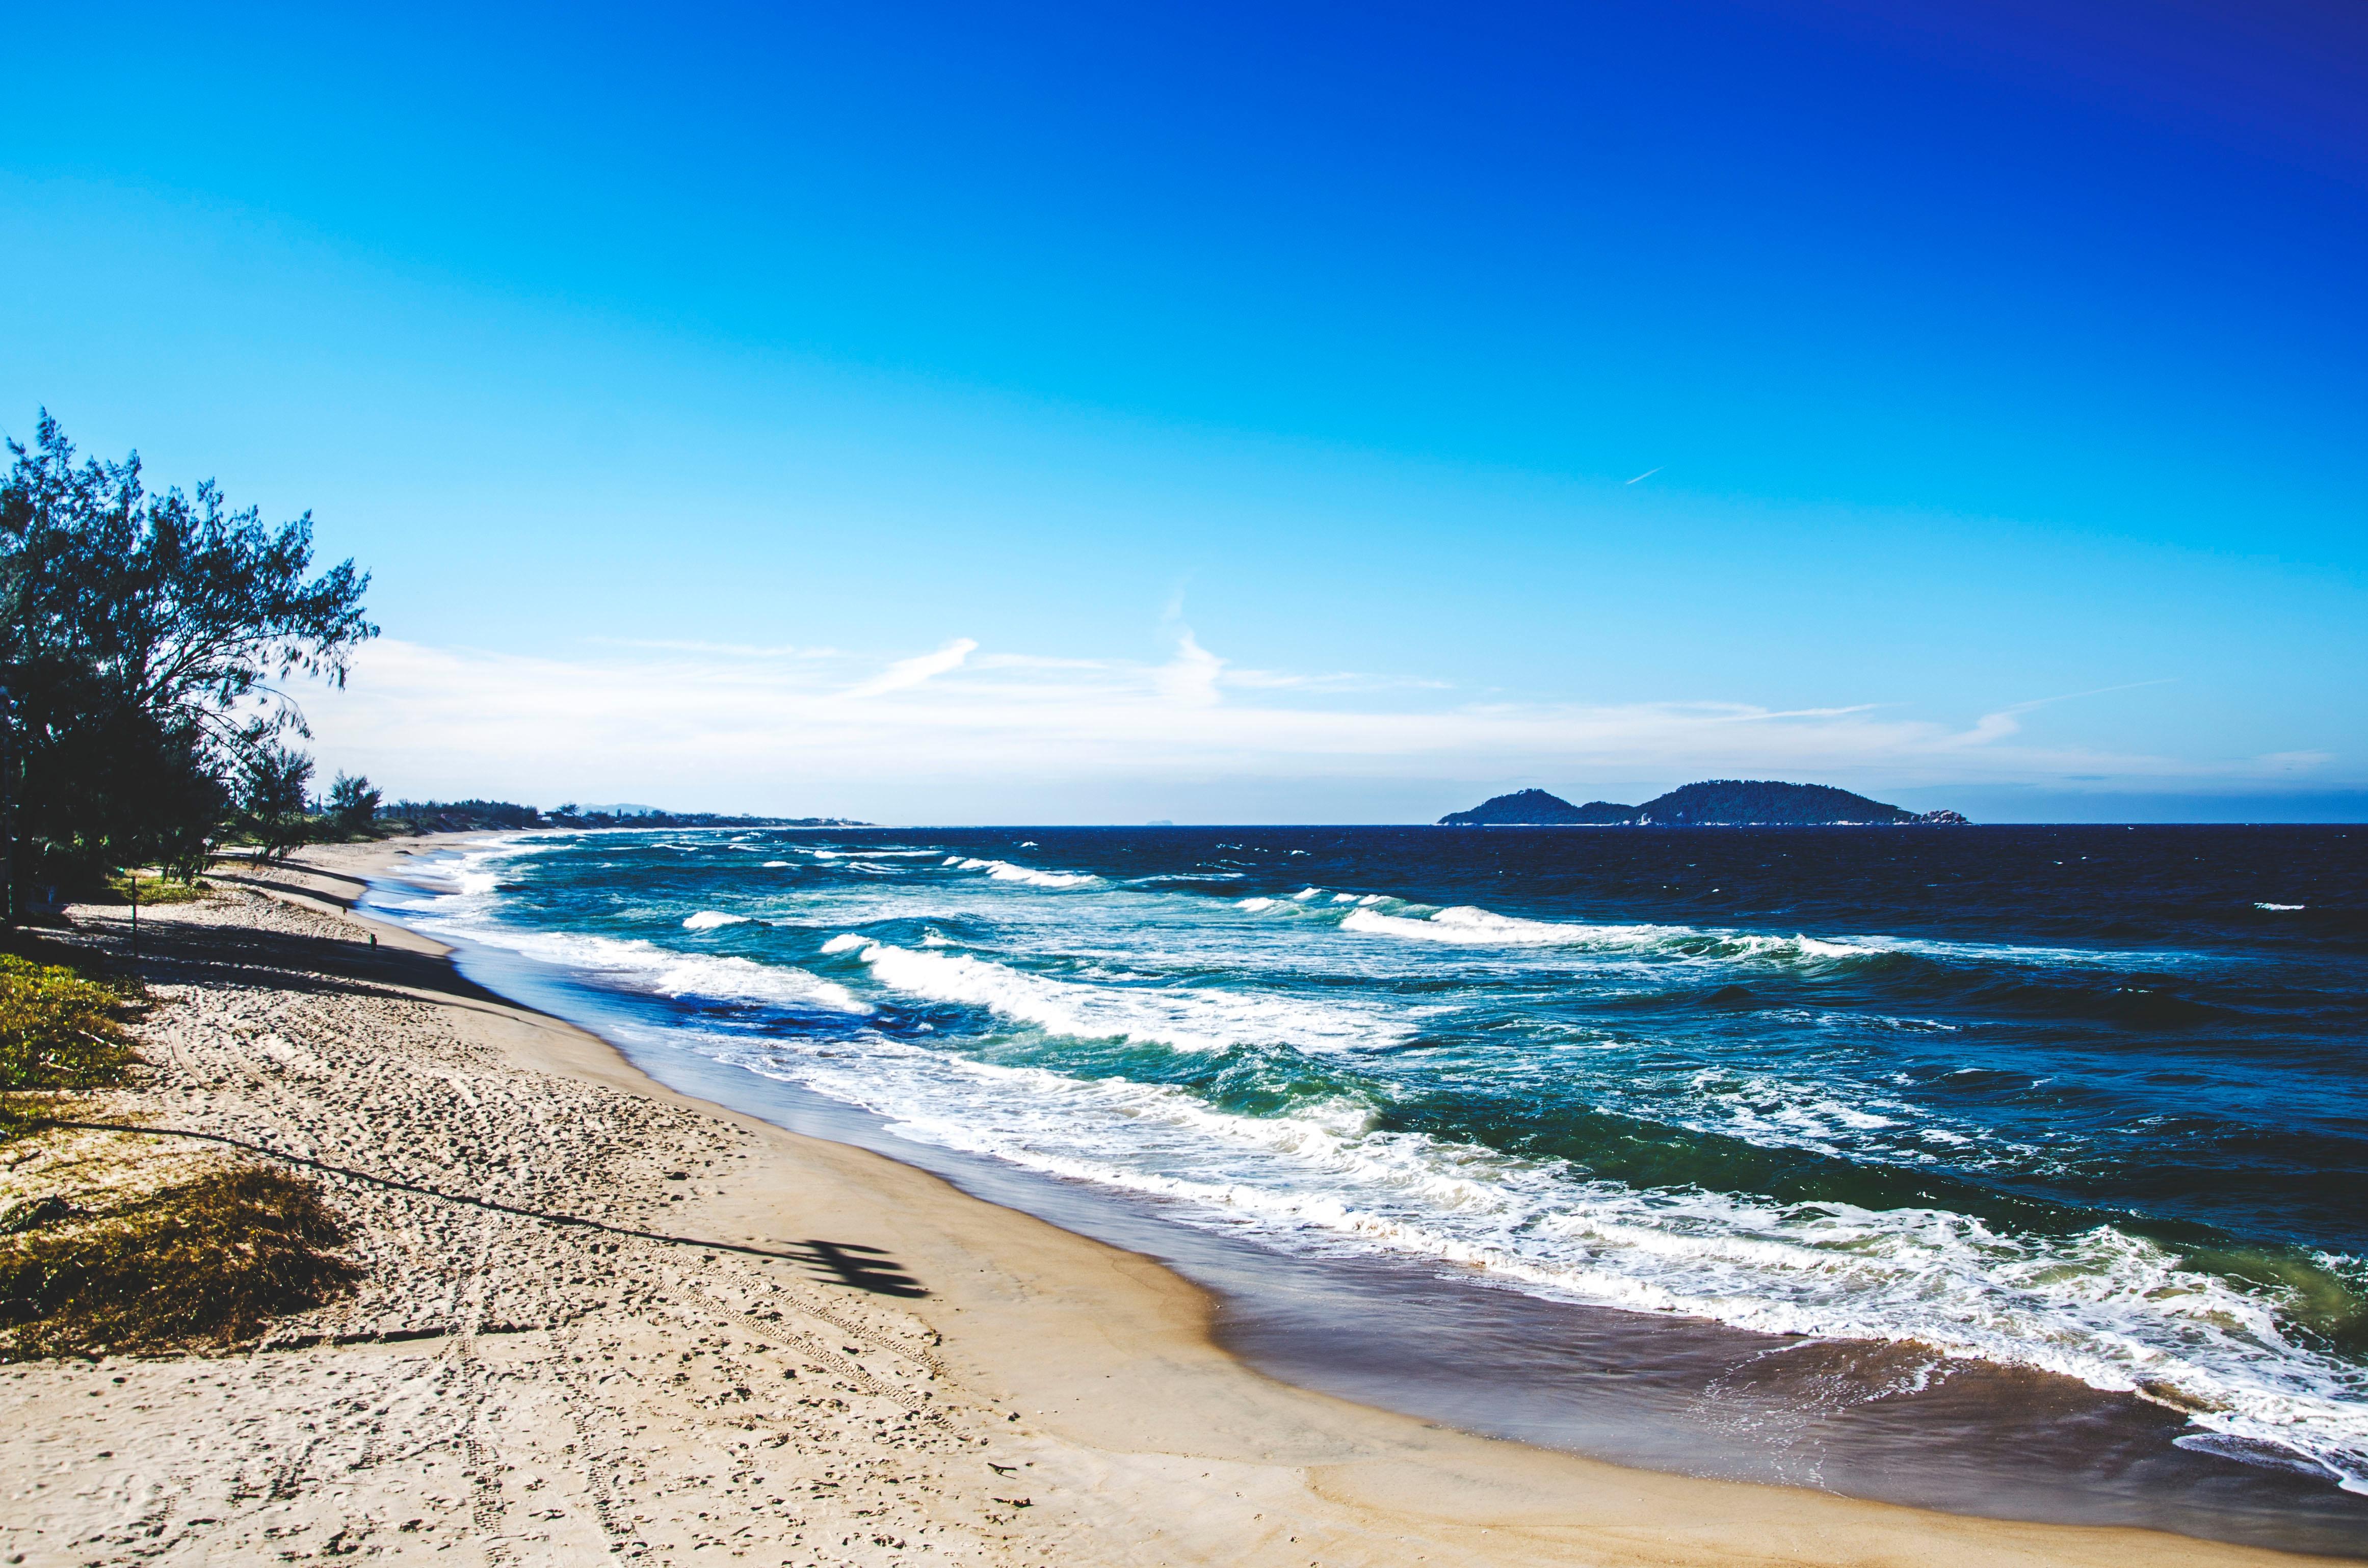 Берег море фото